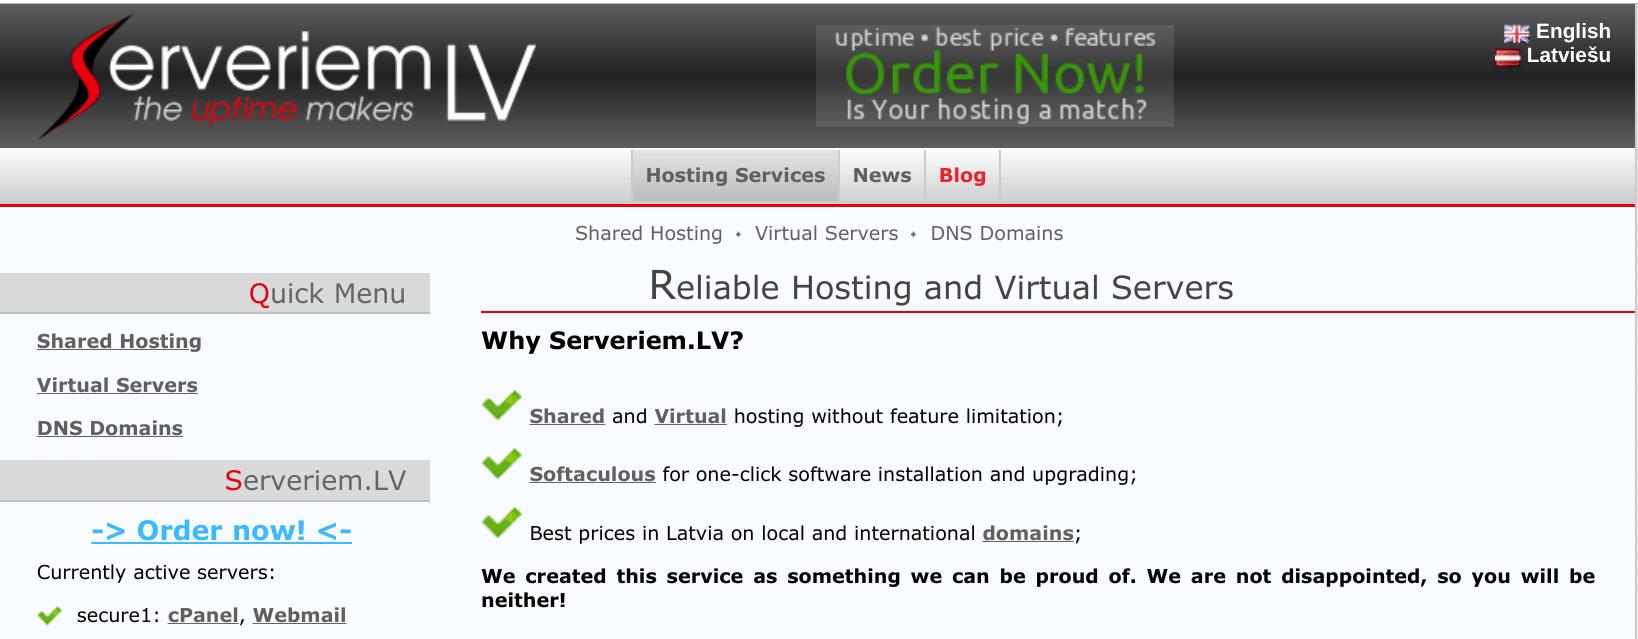 Serveriem.LV